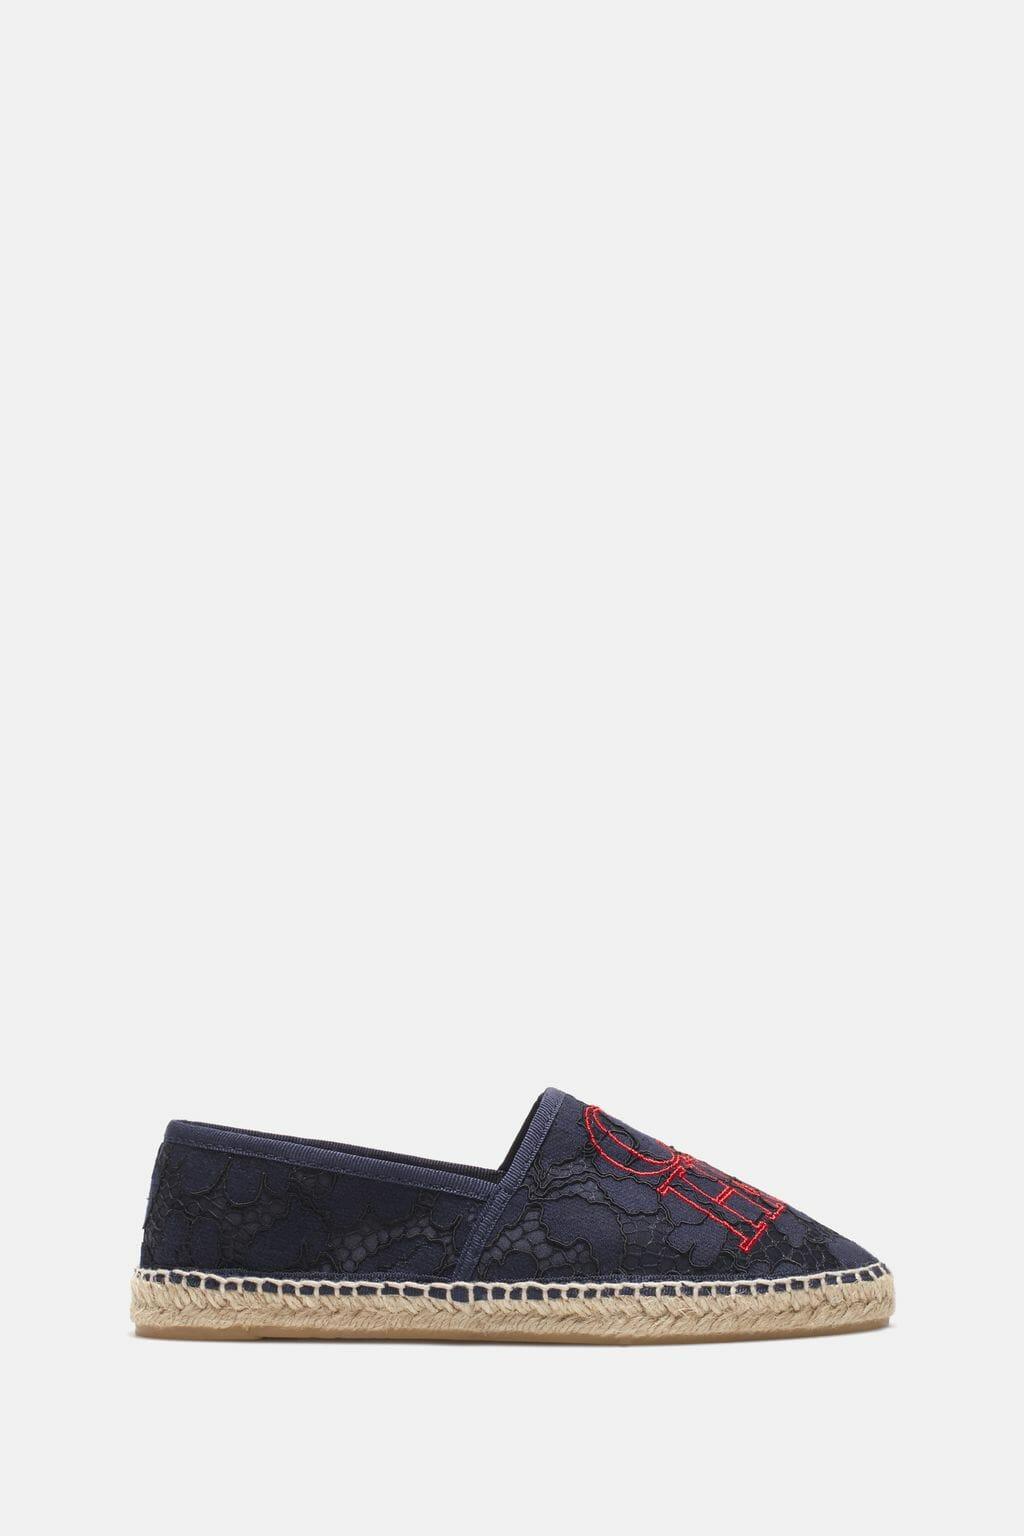 CH-Carolina-herrera-shoes-collection-Spring-Summer-2018-shoe-89